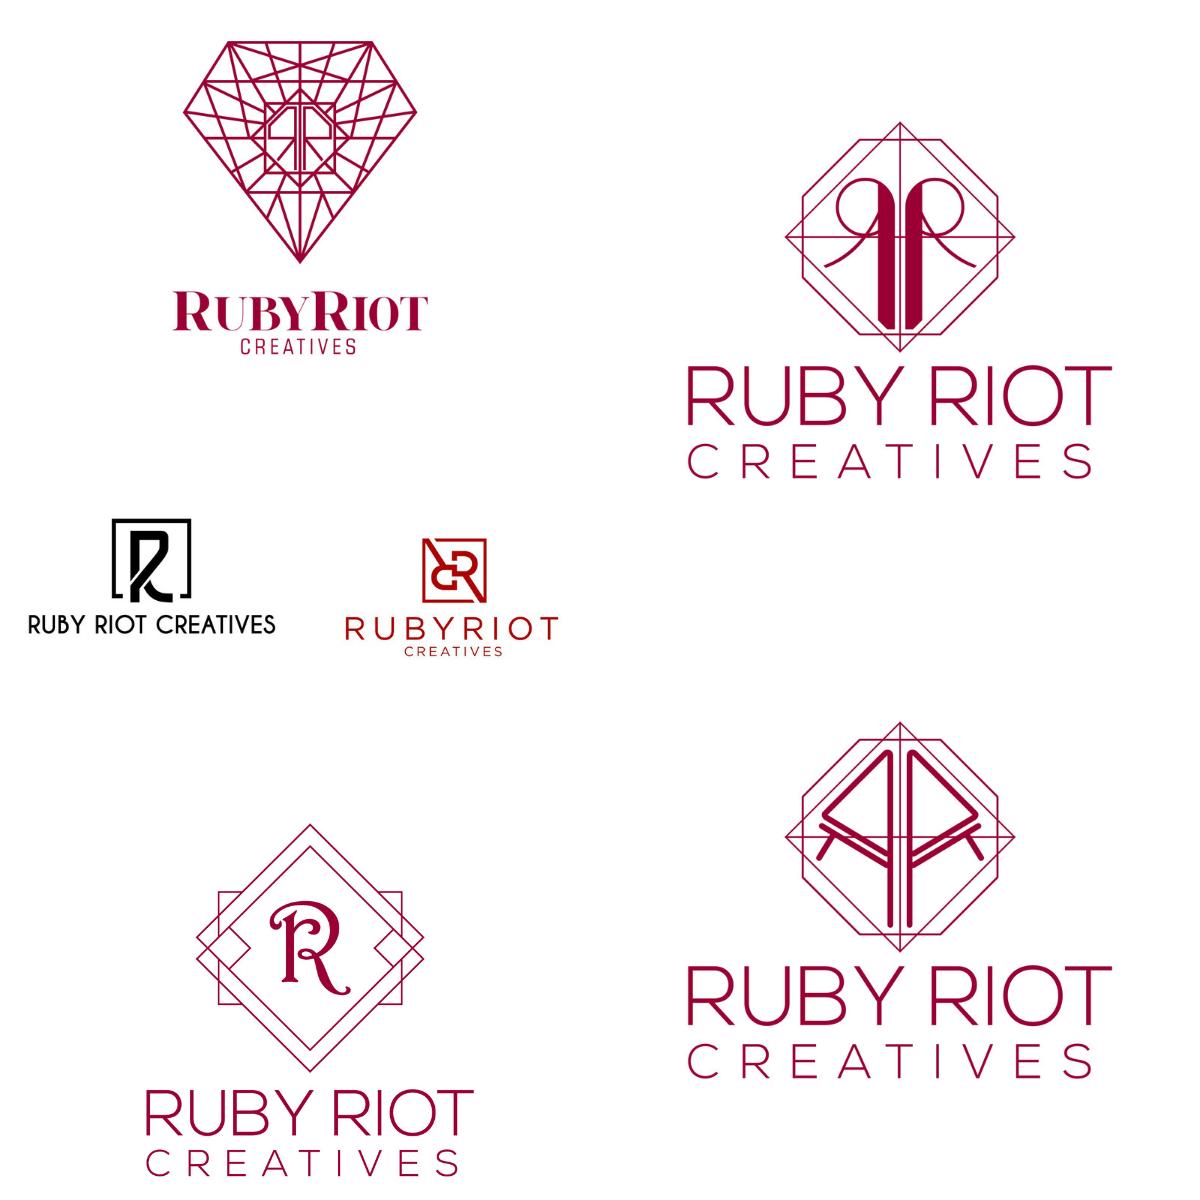 Our logo evolution + brand development.